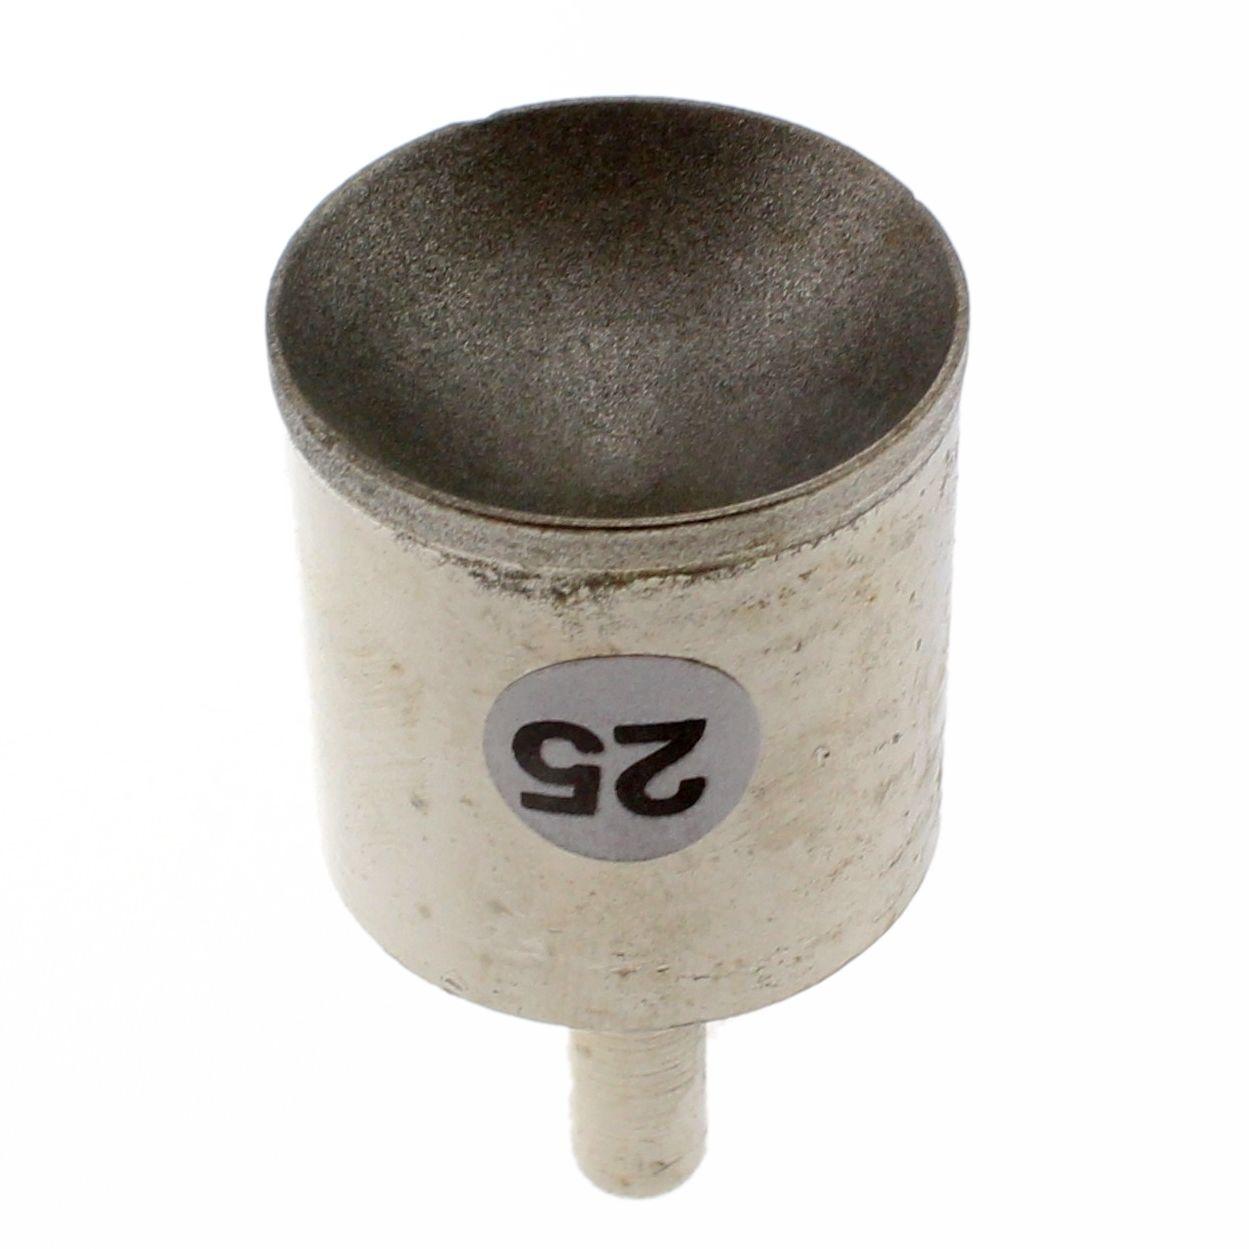 Diamond Mounted Point 10-40 mm SPHERICAL CONCAVE Head Grinding Bit Grit 600 Gems ILOVETOOL 6 inch lapidary concave arc diamond coated grinding wheel grind spherical 6 mm ilovetool